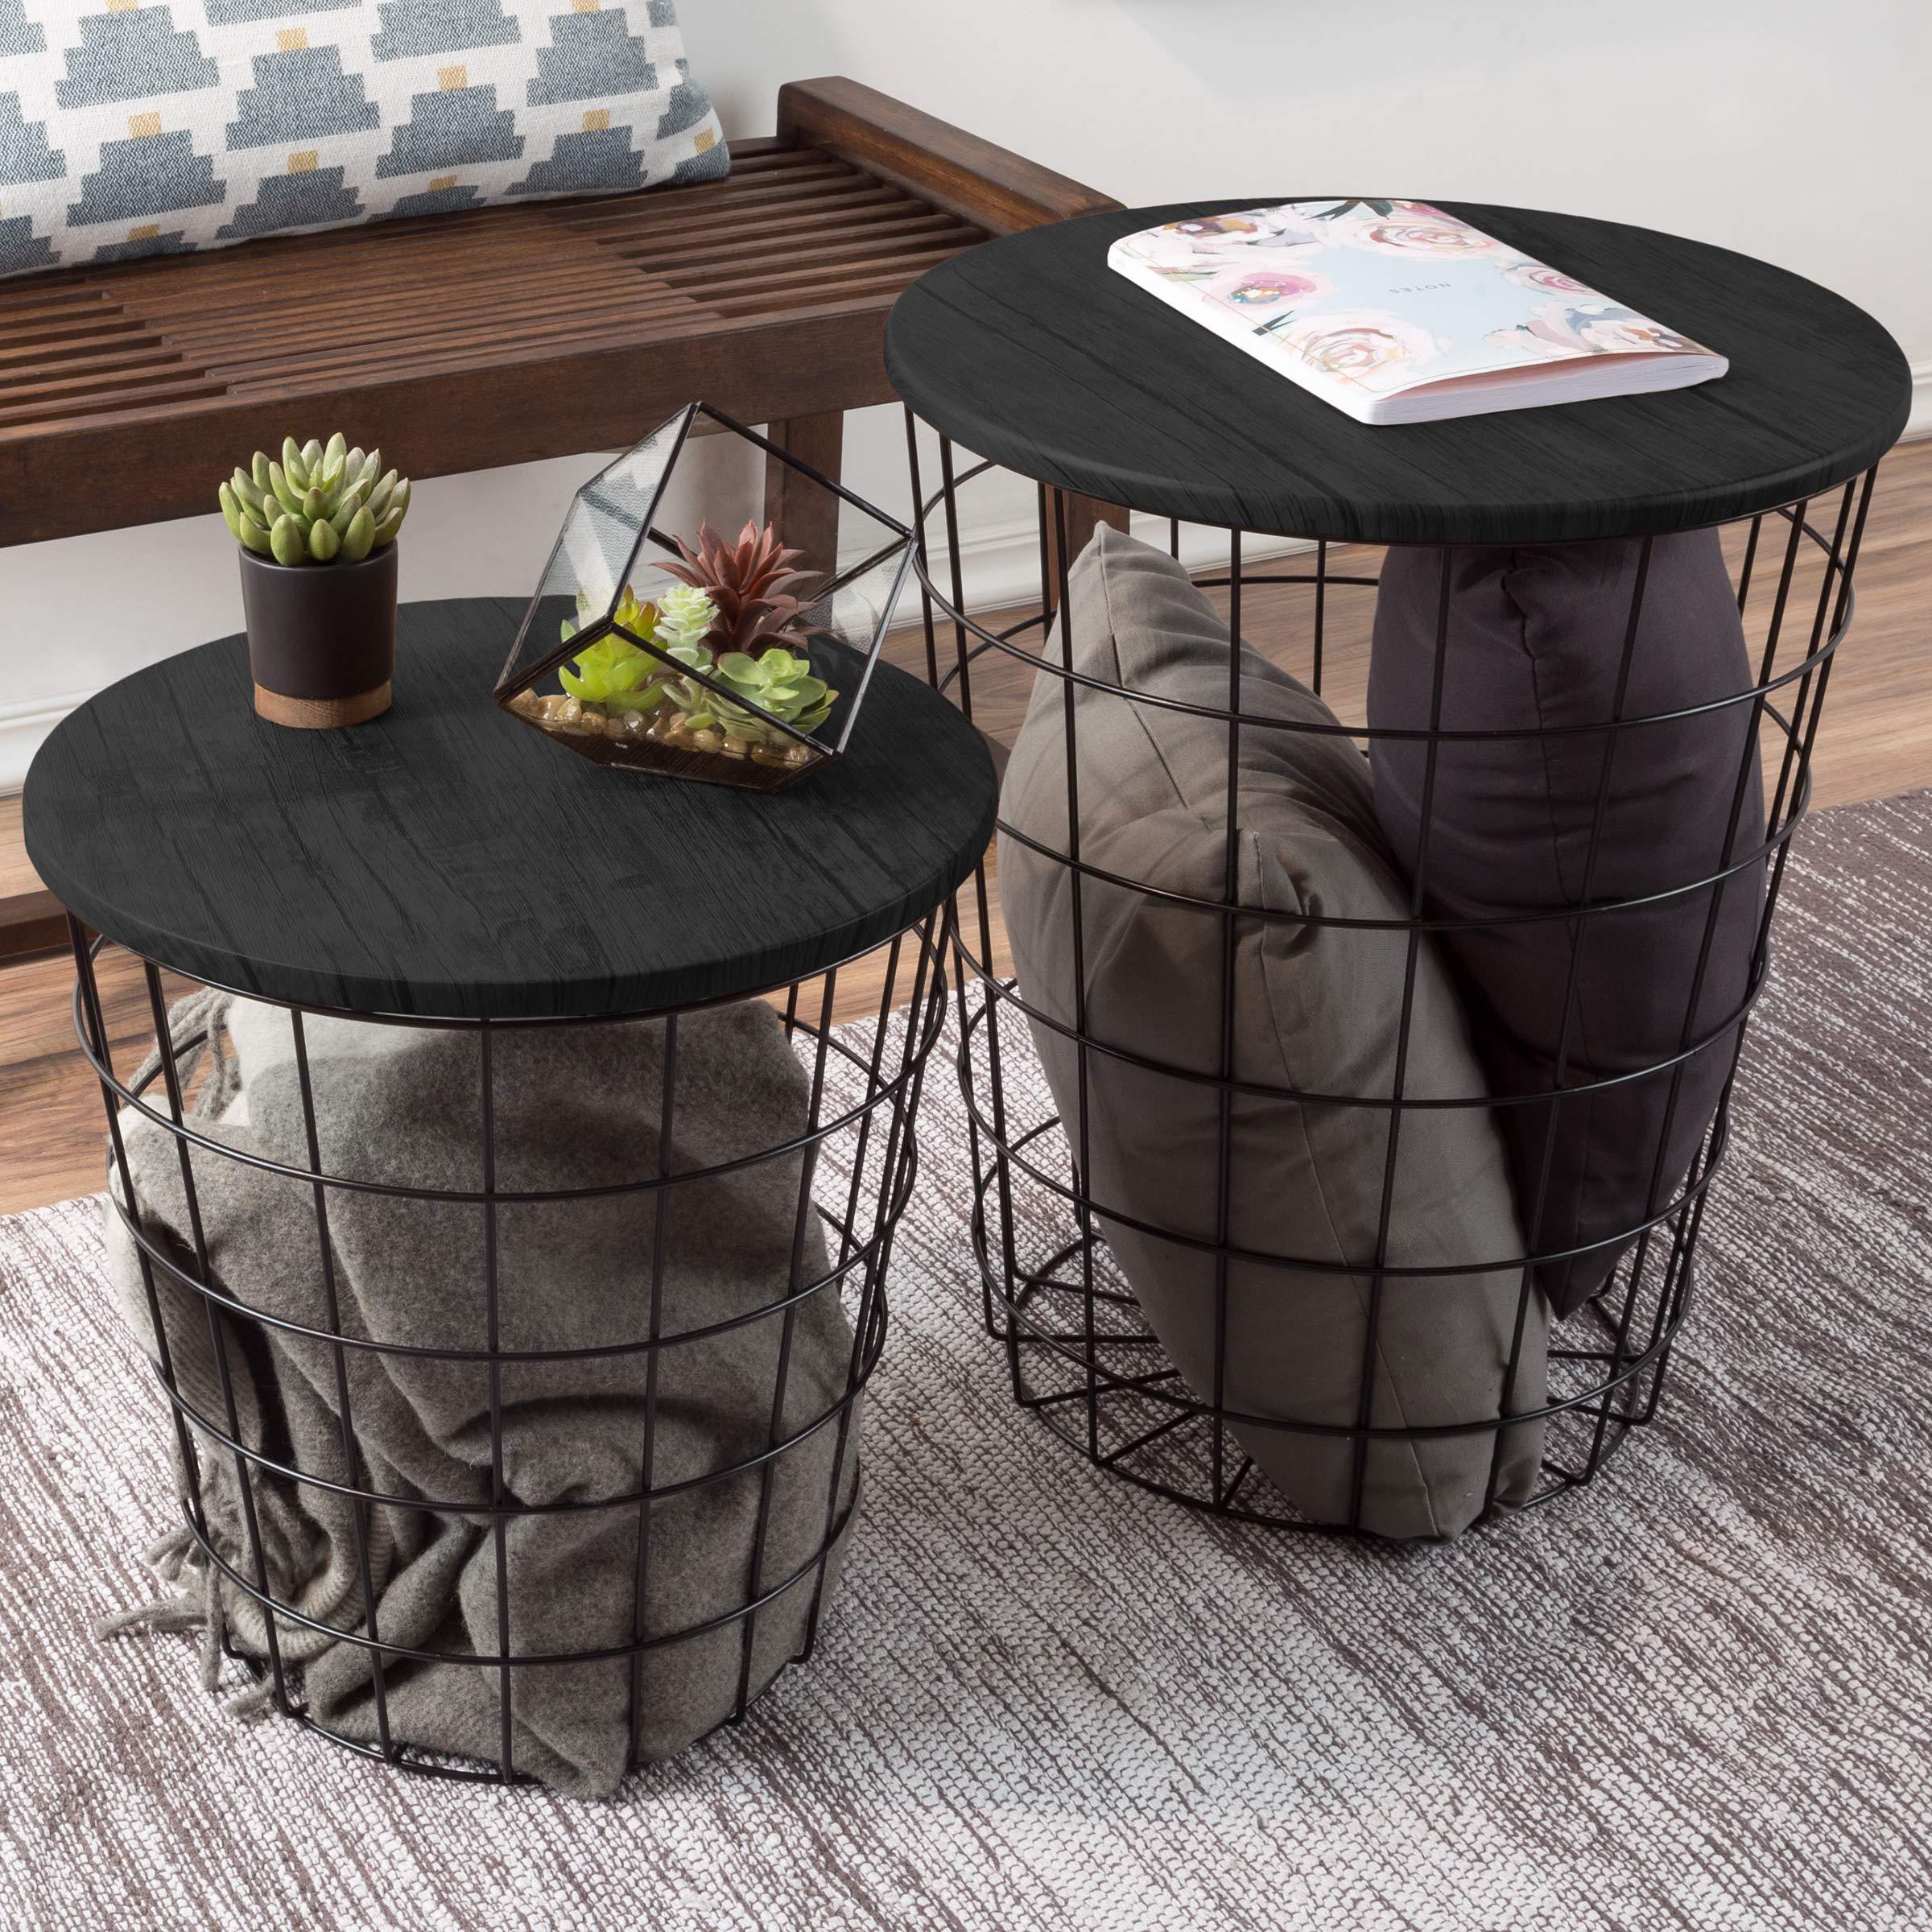 Lavish Home 80-ENDTBL-21 Nesting End Tables with Storage (Black) by Lavish Home